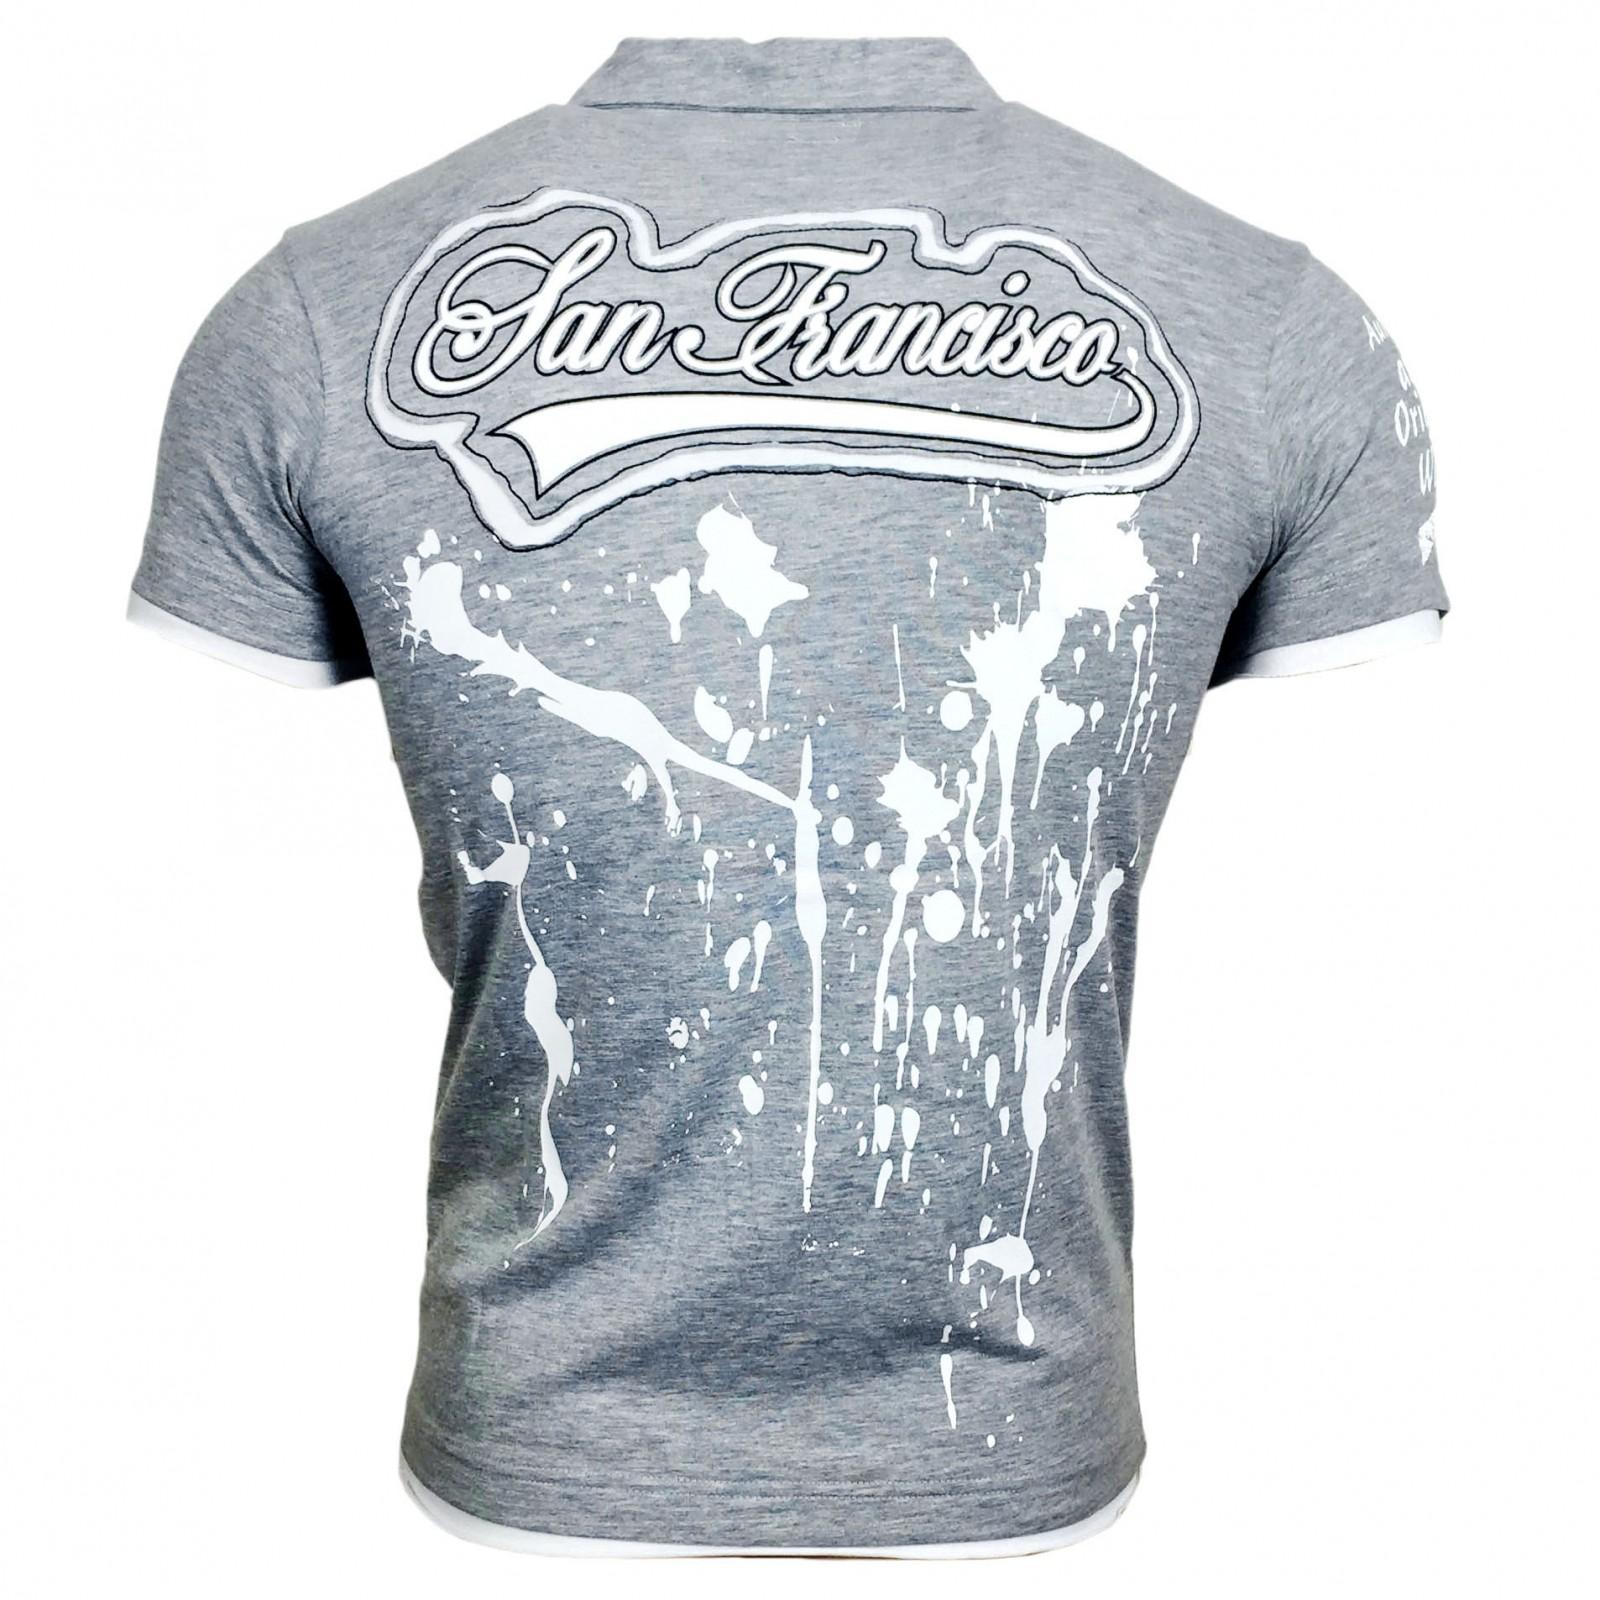 T Shirt Herren Kurzarm Weiß Grau A11610